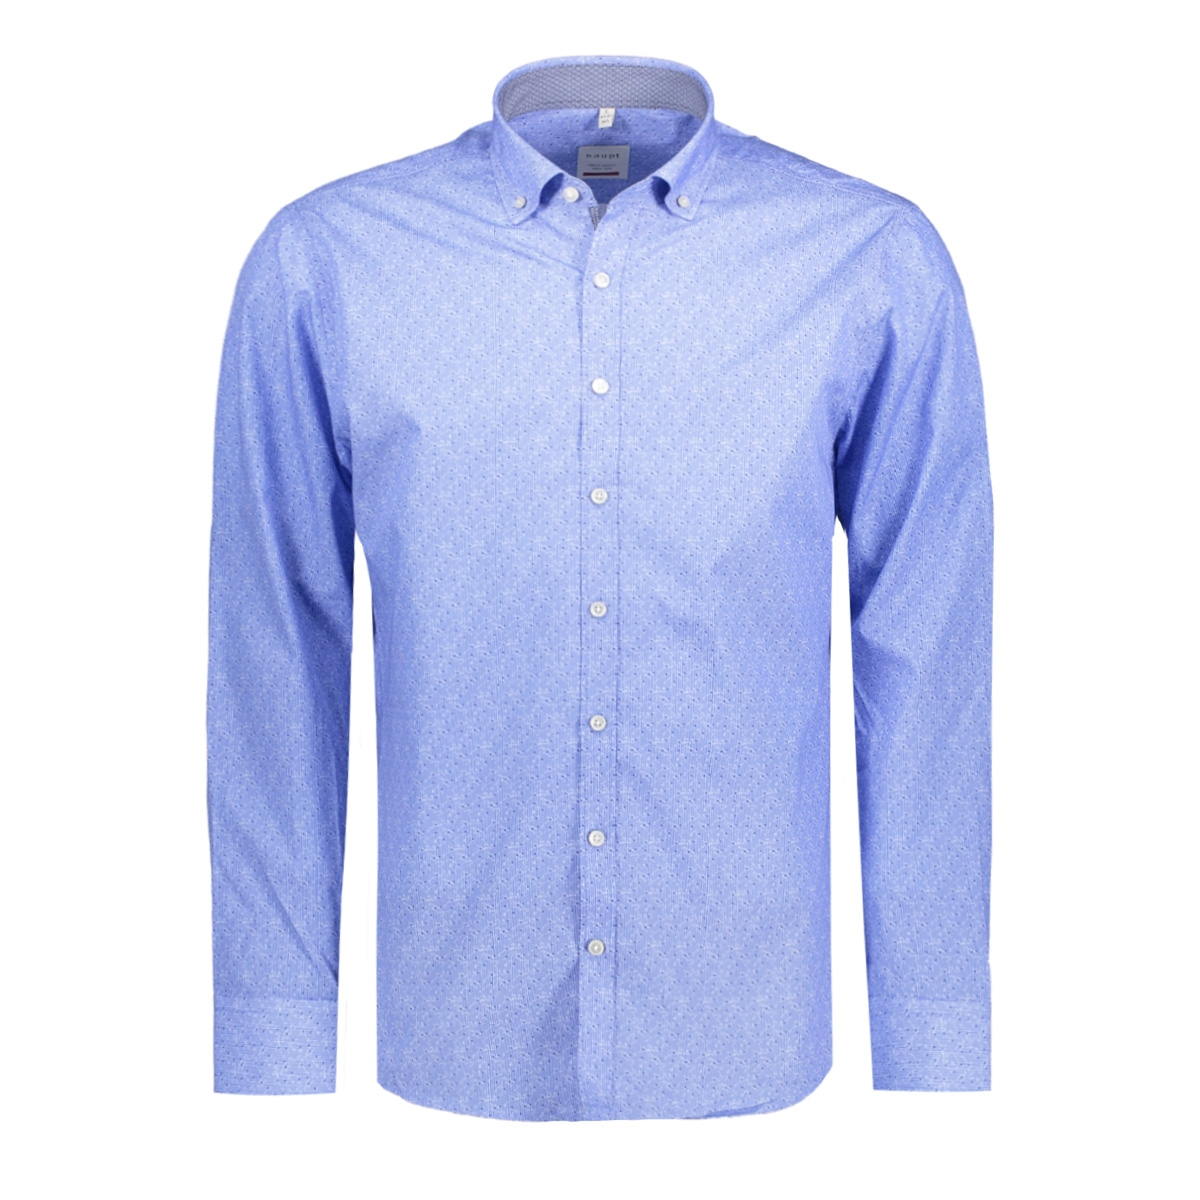 3250 7003 haupt overhemd 02